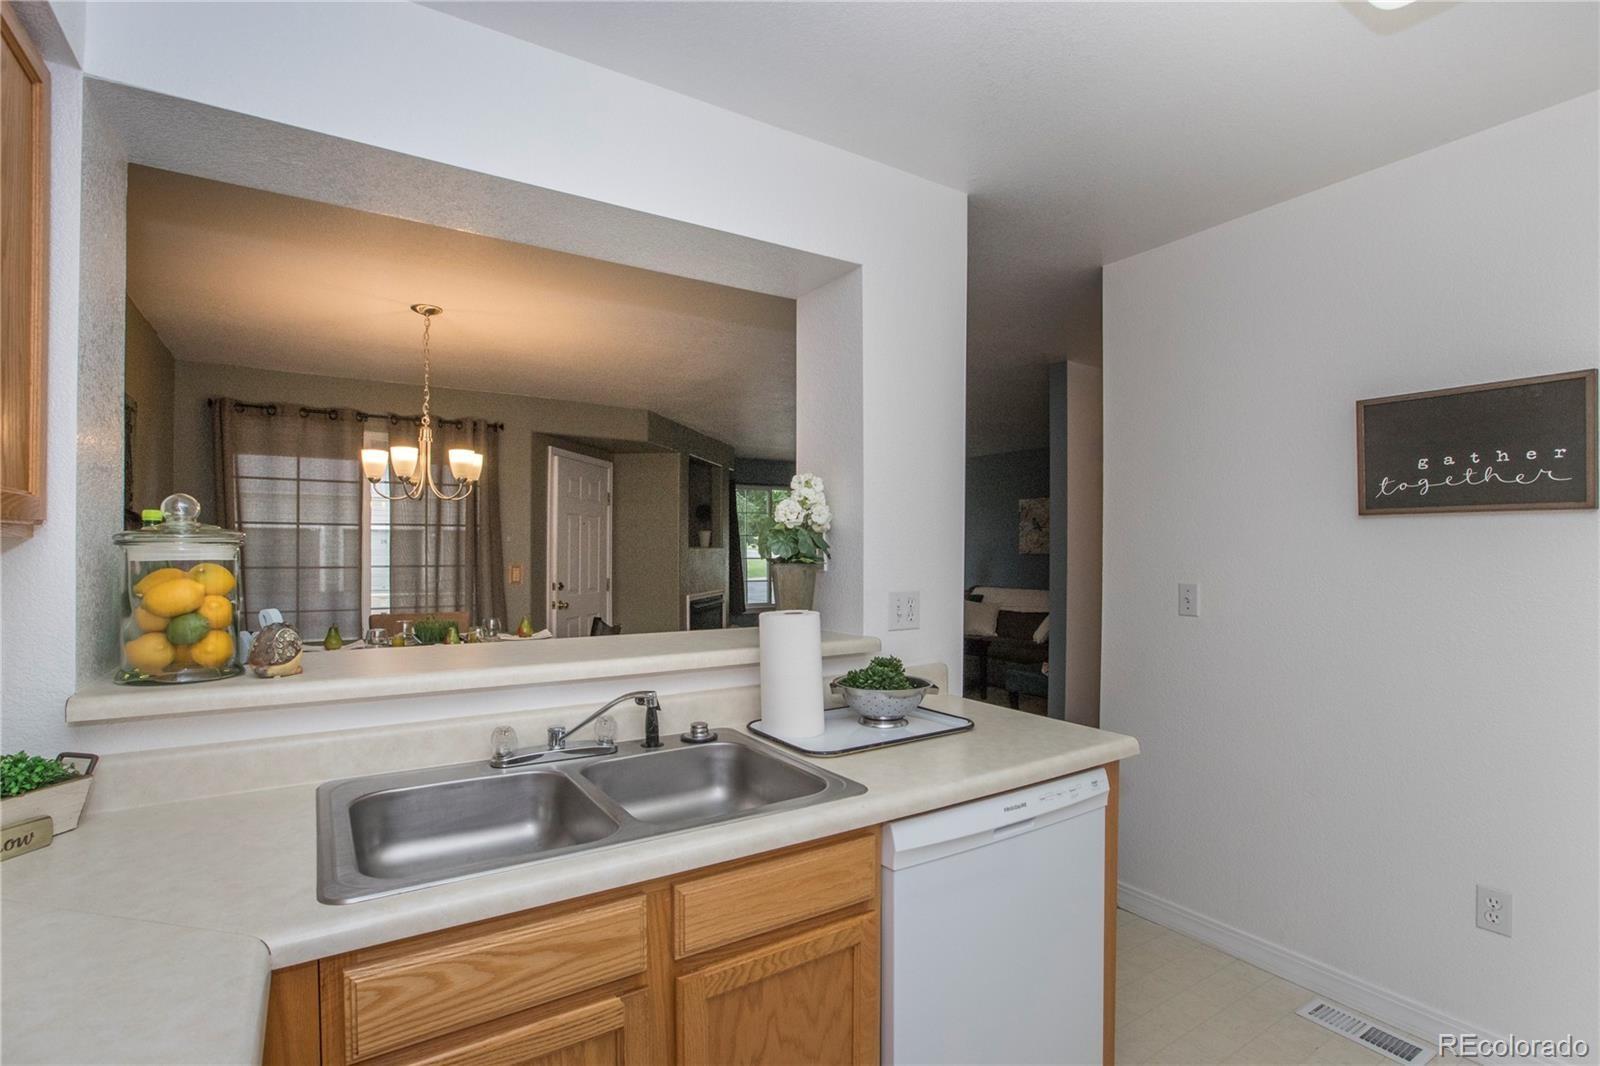 MLS# 3758449 - 17 - 6802 Antigua Drive #26, Fort Collins, CO 80525